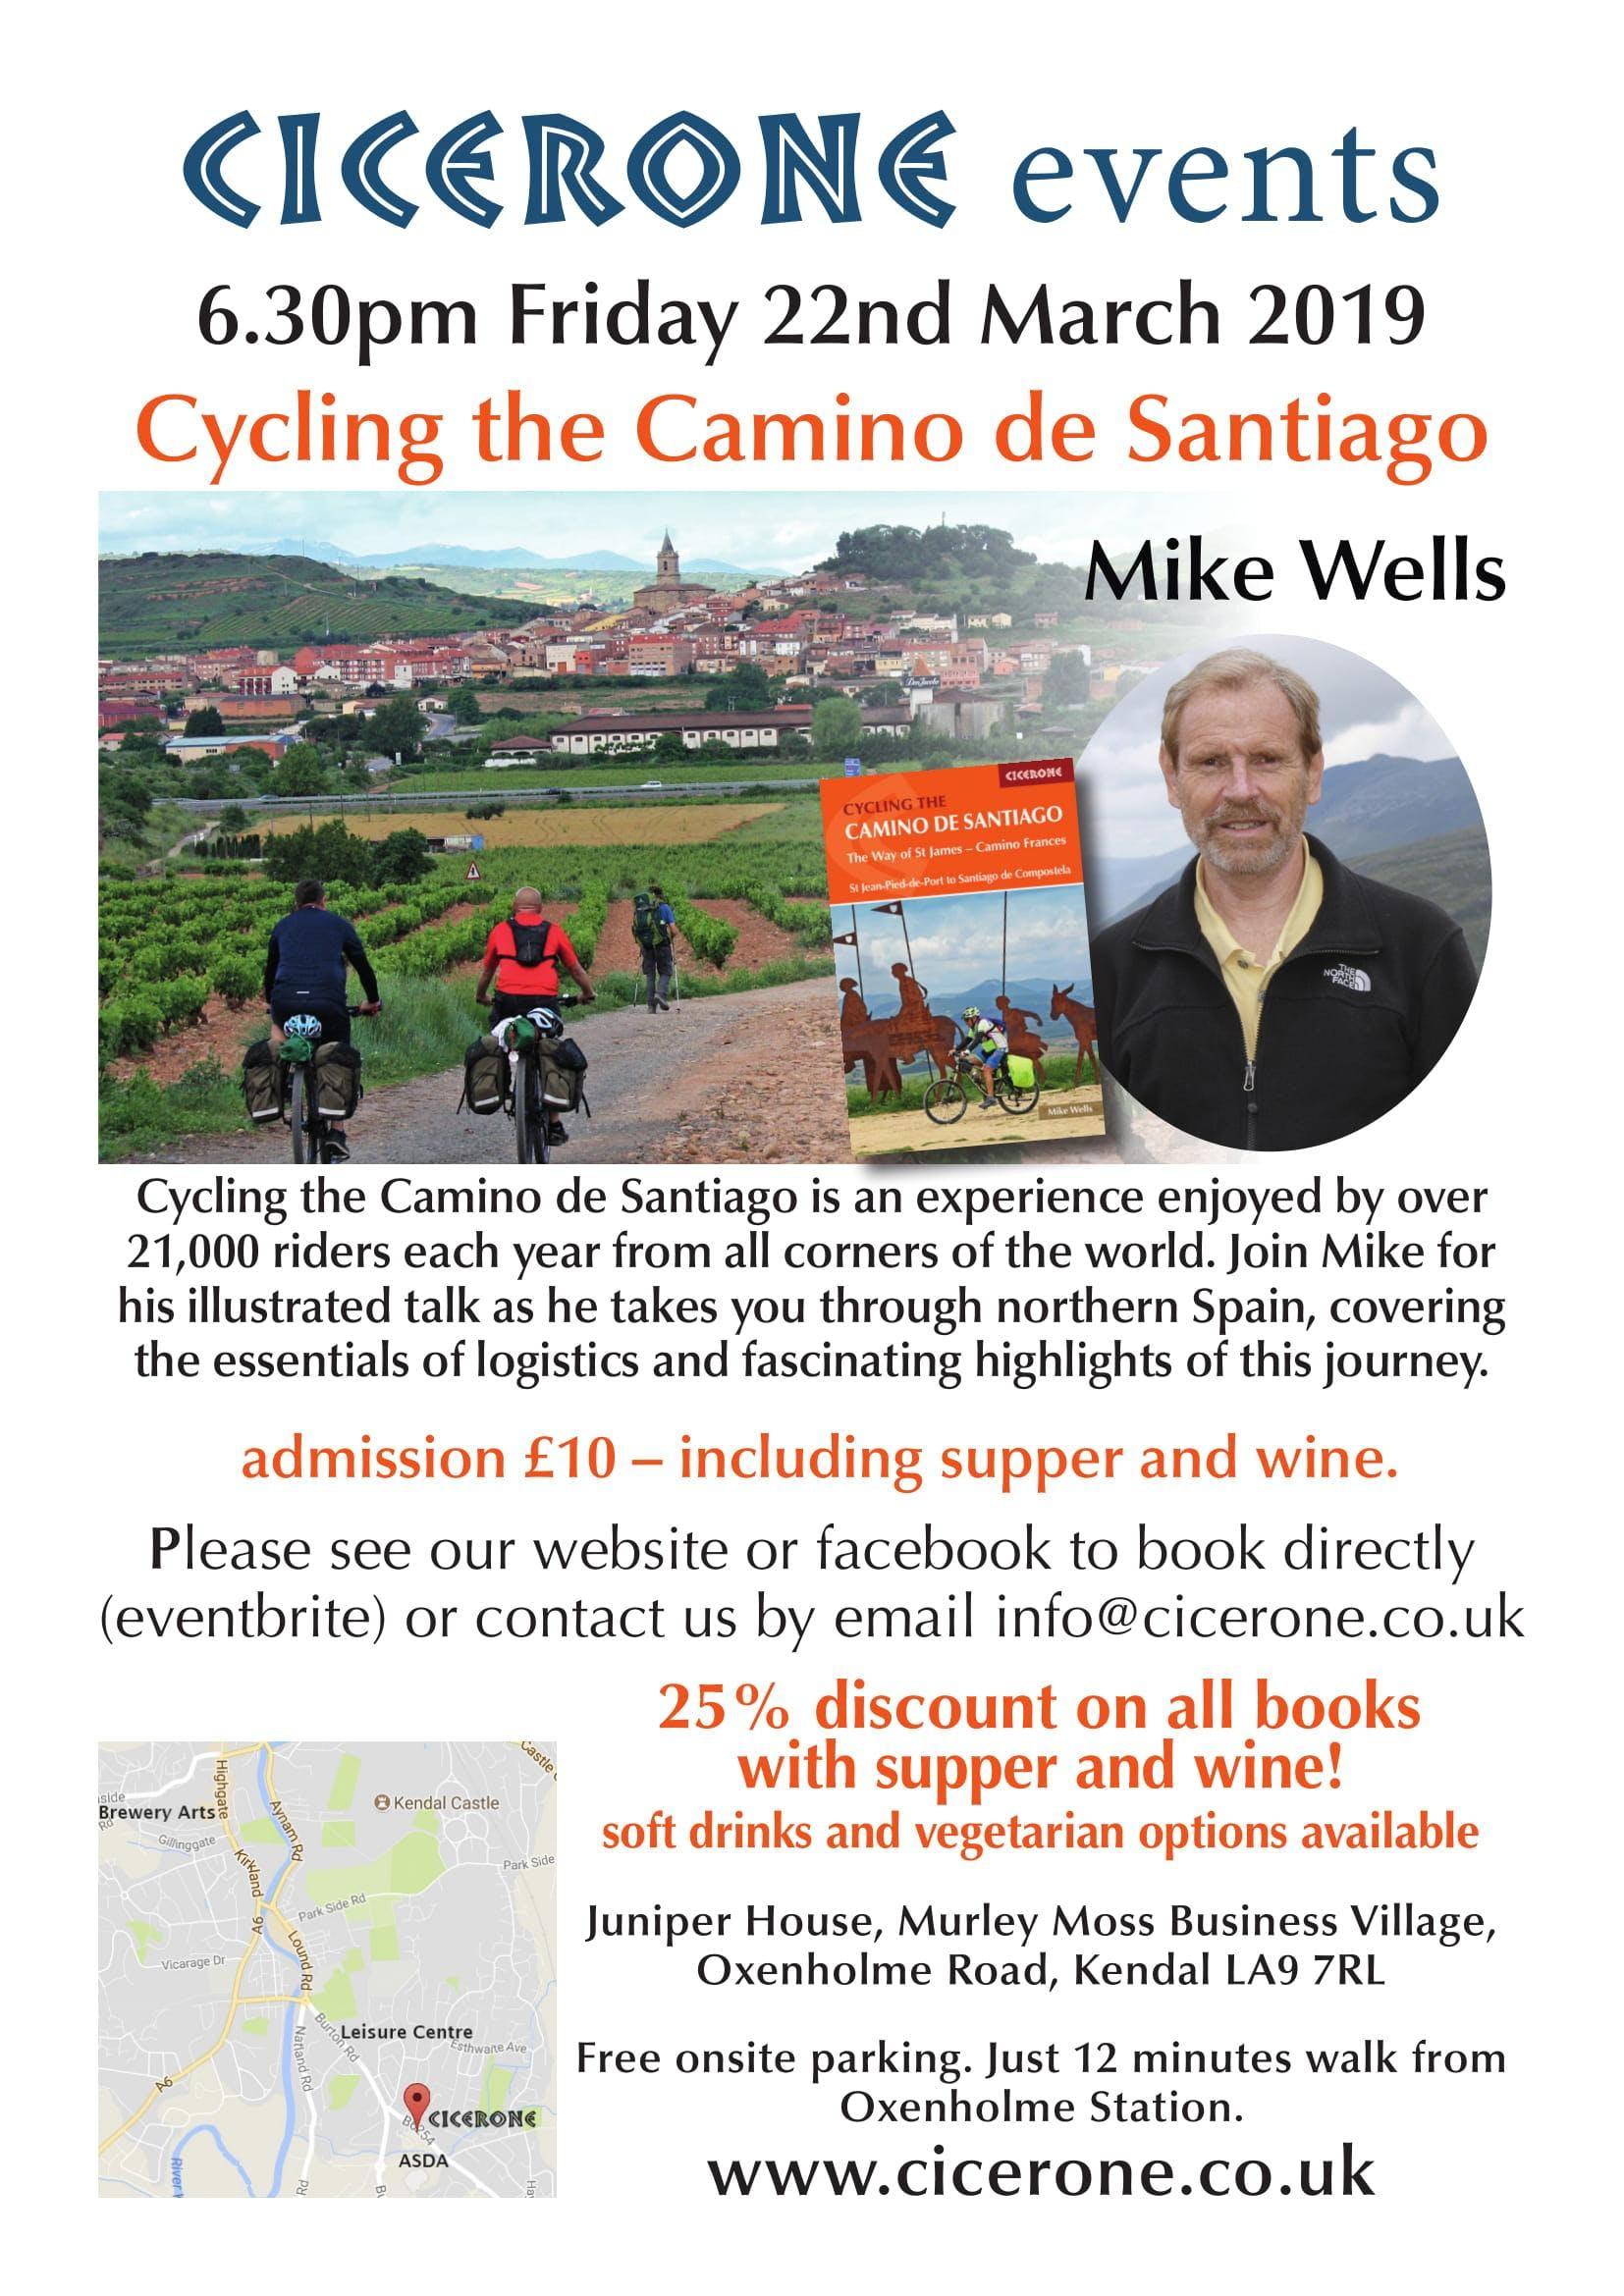 Cycling the Camino de Santiago - talk by Mike